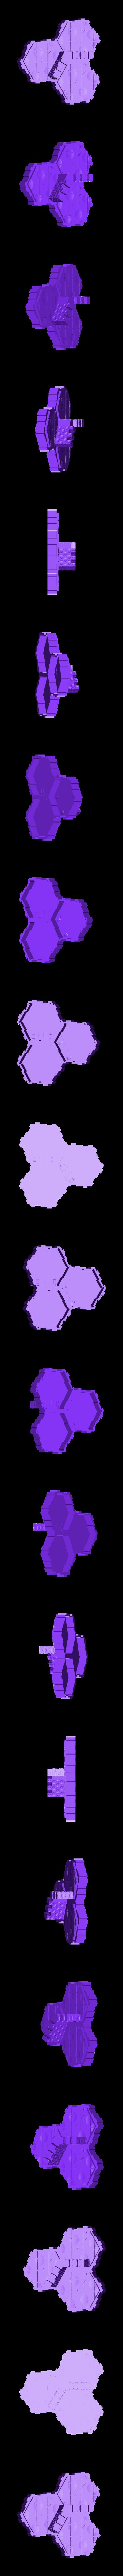 3hex_stone_with_wall_1.stl Download free STL file Locking Hex Terrain Stone Path • 3D print object, mrhers2